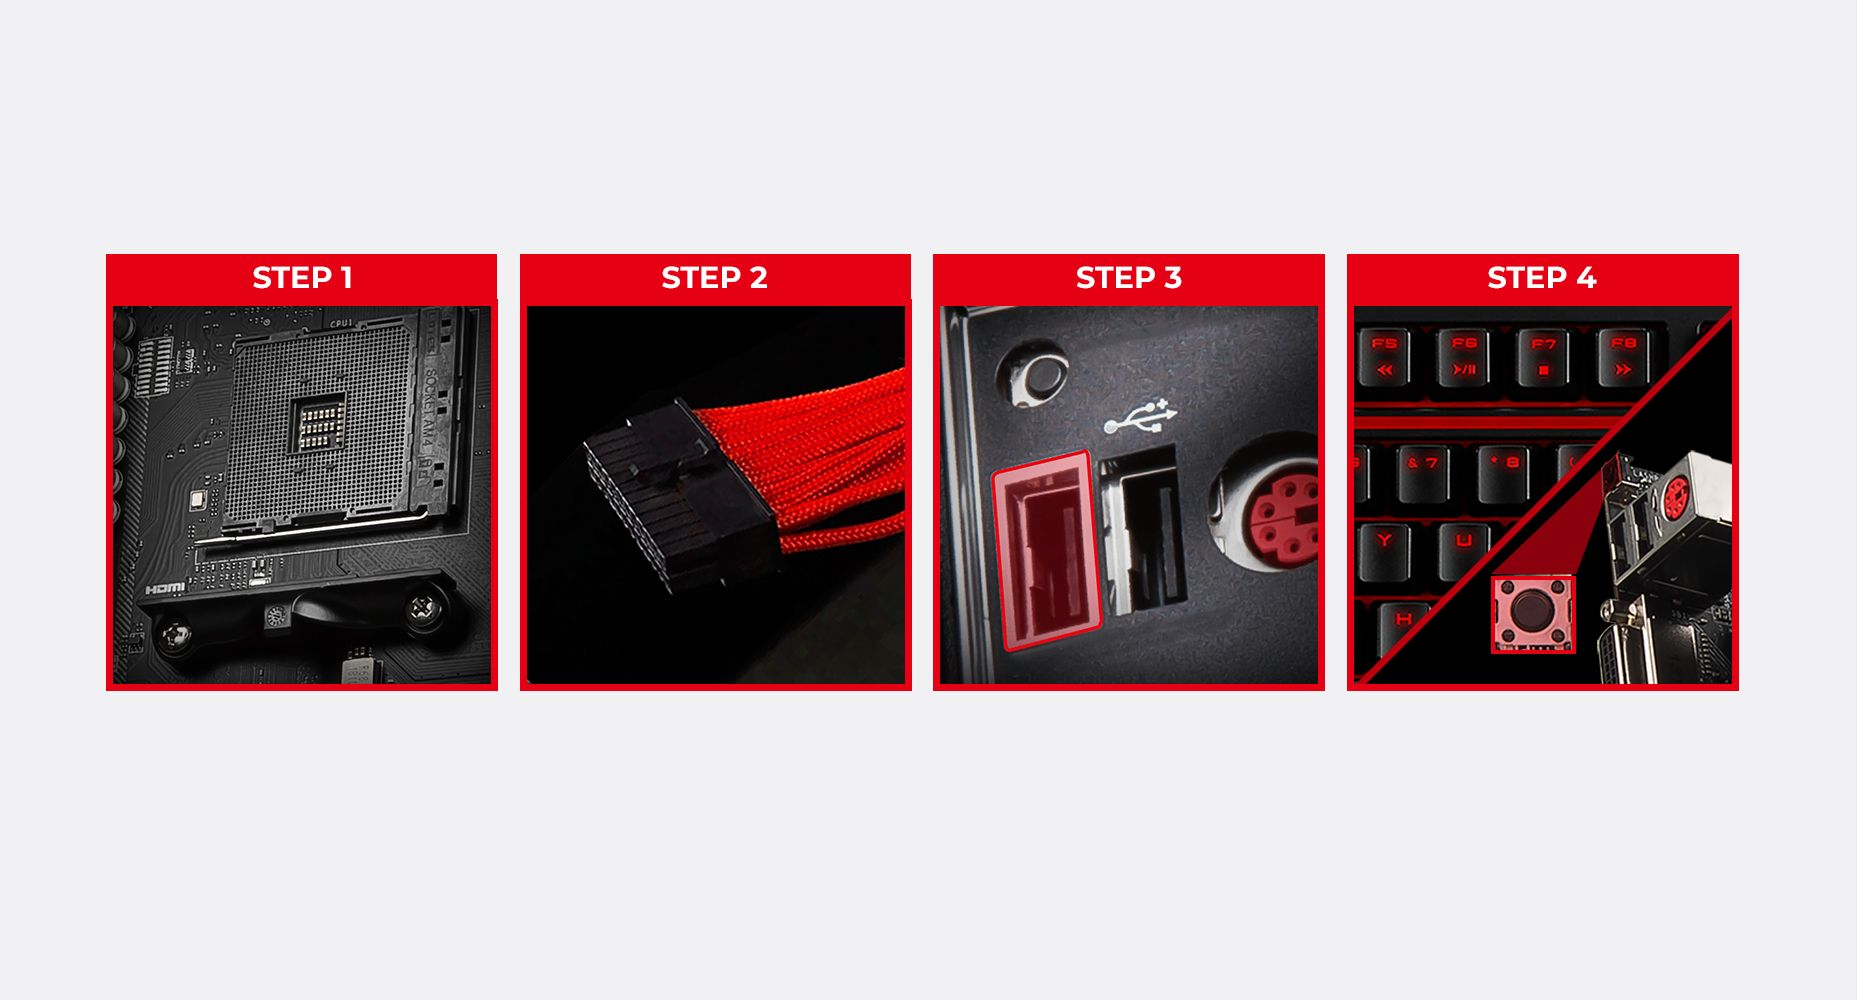 MSI B450 TOMAHAWK MAX II EASY BIOS RECOVERY WITH FLASH BIOS BUTTON